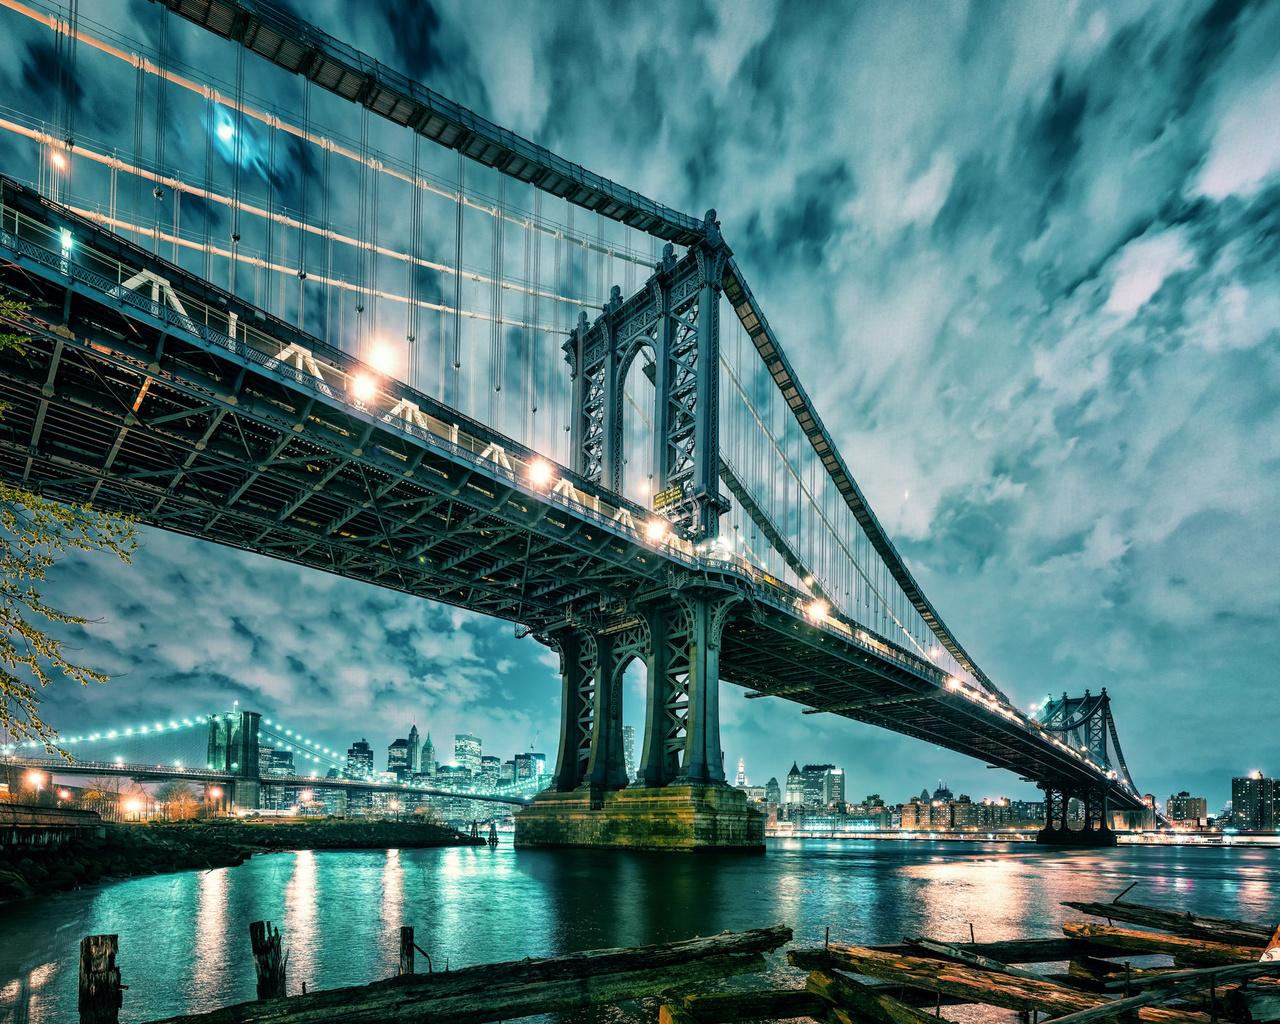 манхэттен, бруклинский мост, ночь, город, иллюминация